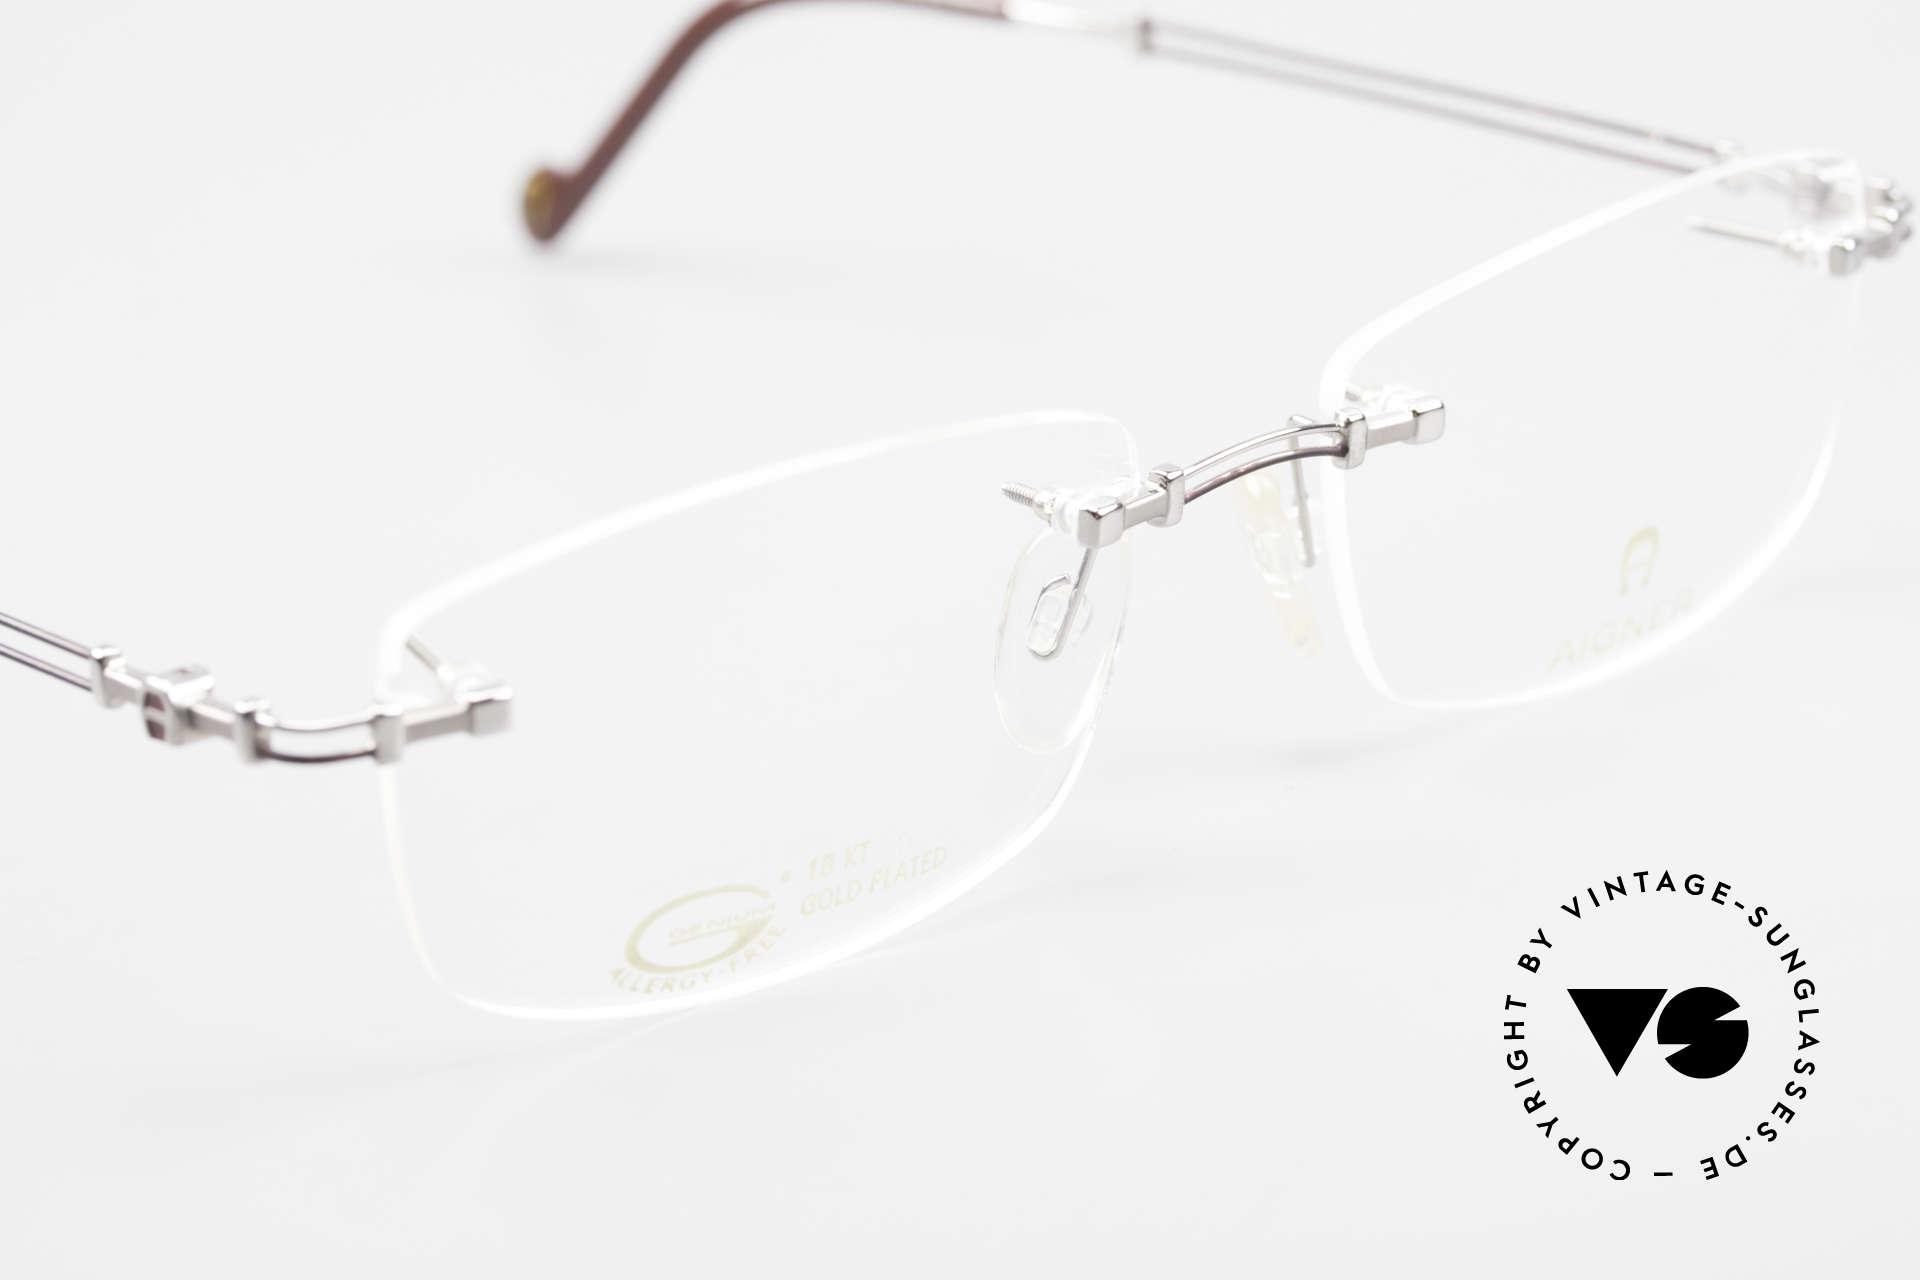 Aigner EA498 Rimless Vintage Glasses 90's, NO RETRO eyeglass-frame; but genuine vintage commodity, Made for Men and Women